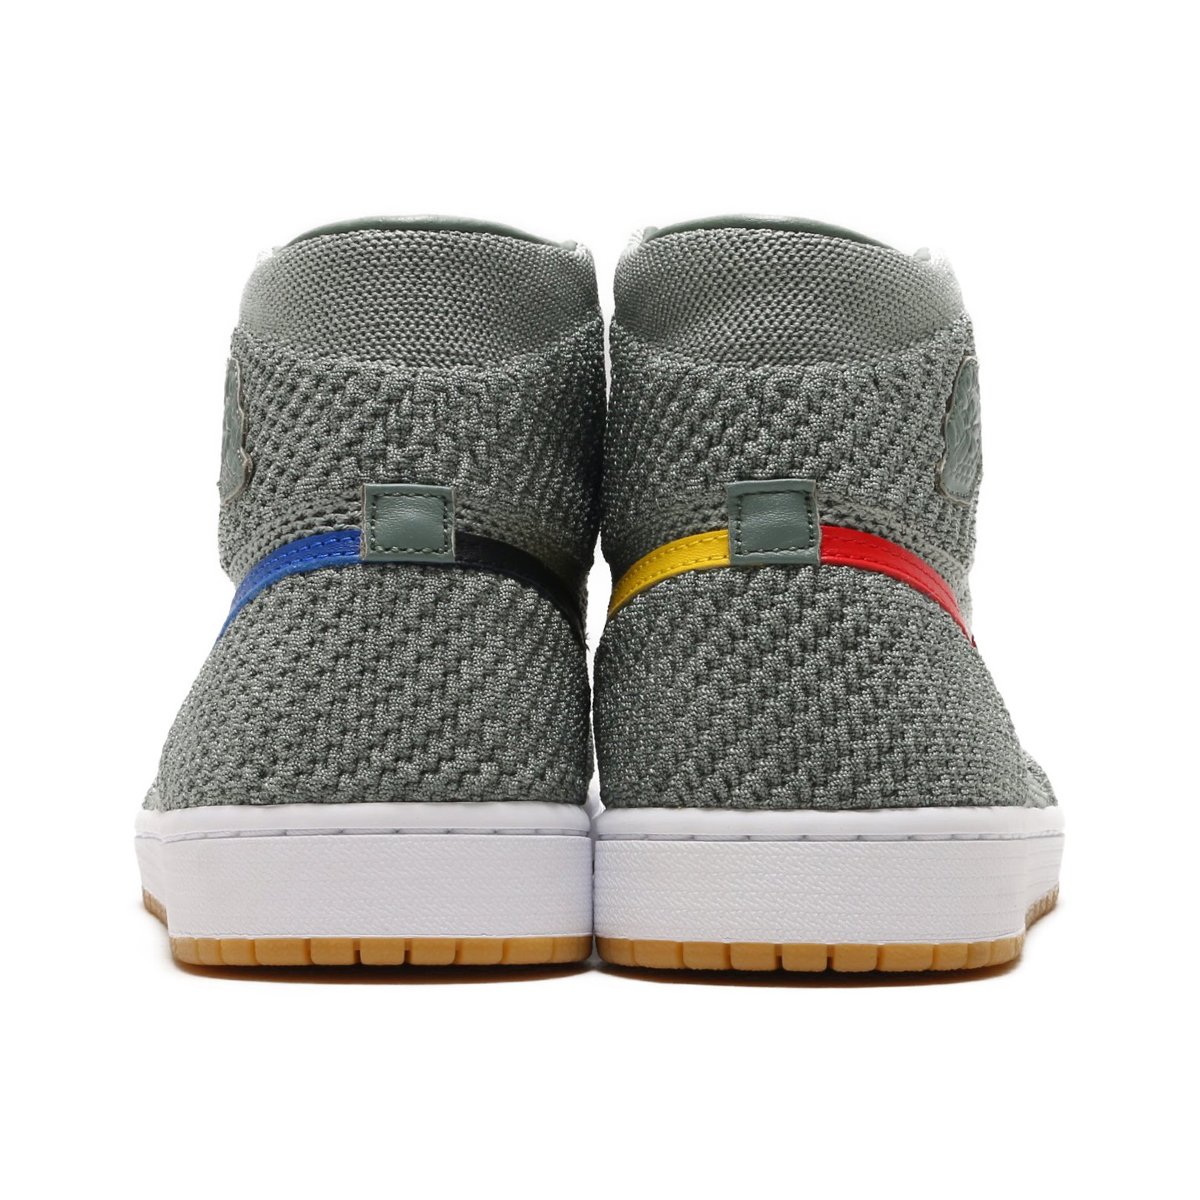 b81cf8f6ee5062 NIKE AIR JORDAN 1 RETRO HI FLYKNIT (Nike Air Jordan 1 nostalgic high fried  food knit) (CLAY GREEN WHITE-HYPER COBALT-GUM YELLOW) 18SU-S